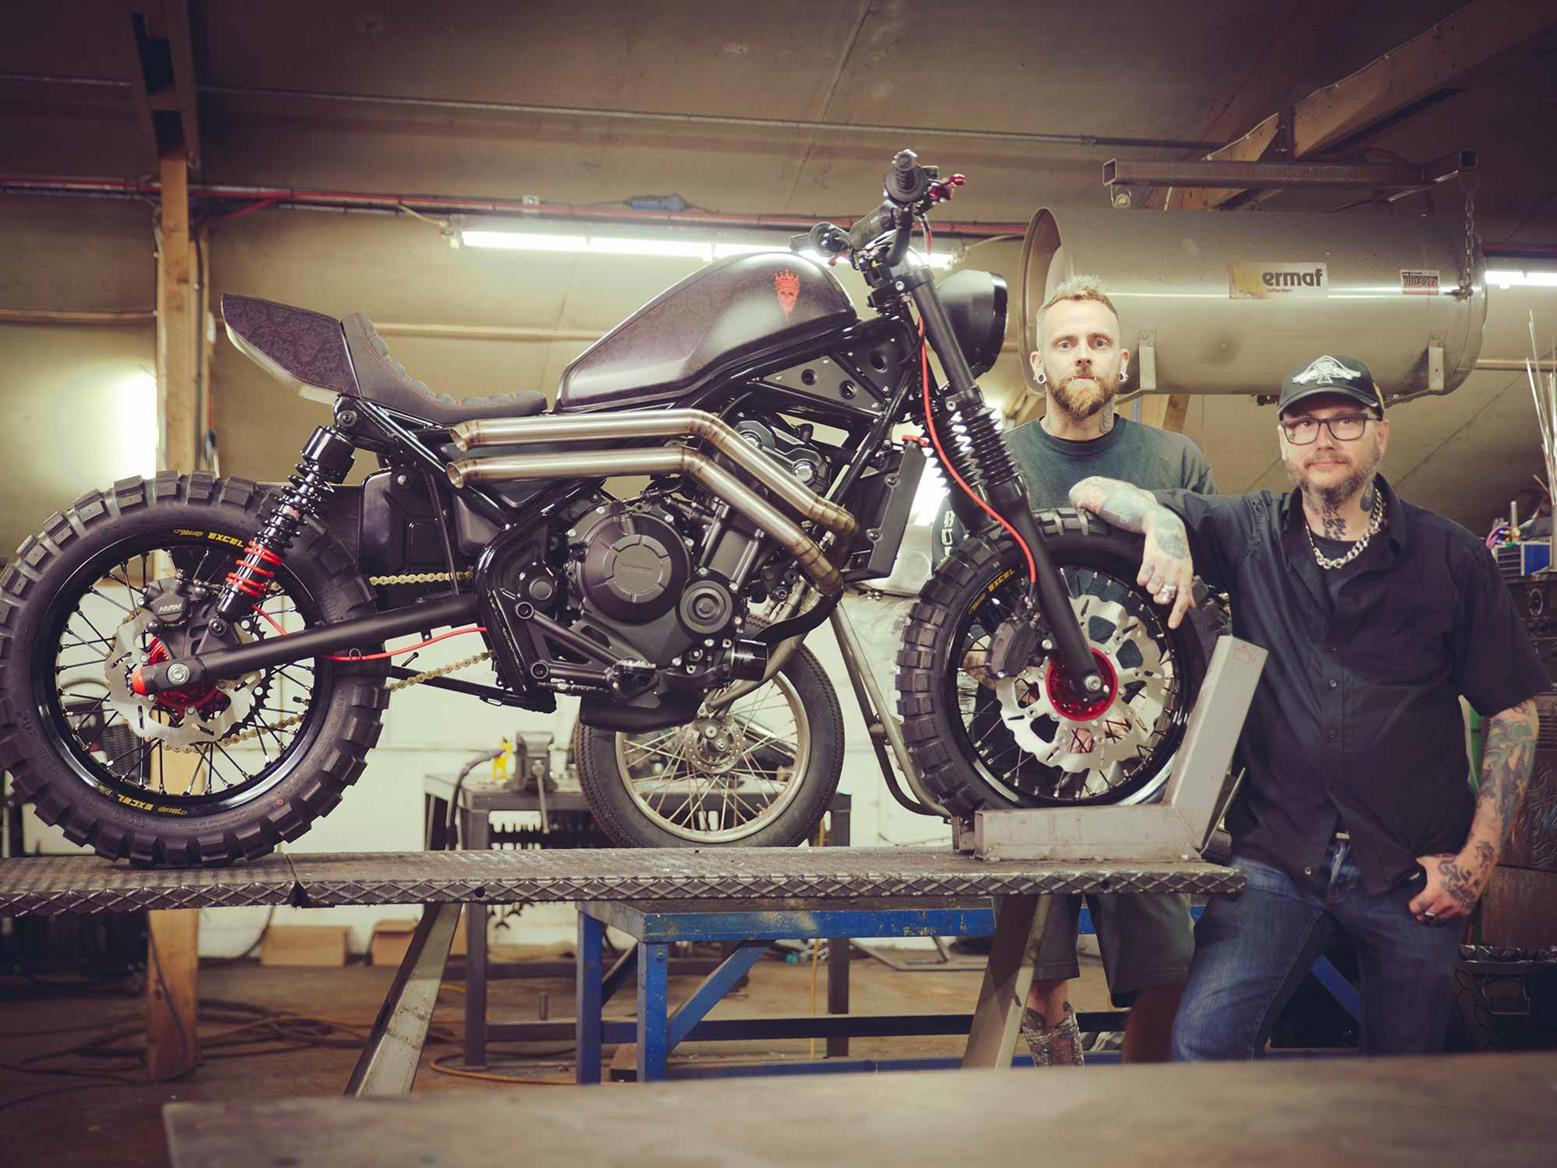 A custom Honda Rebel by tattoo artist Dan Gold